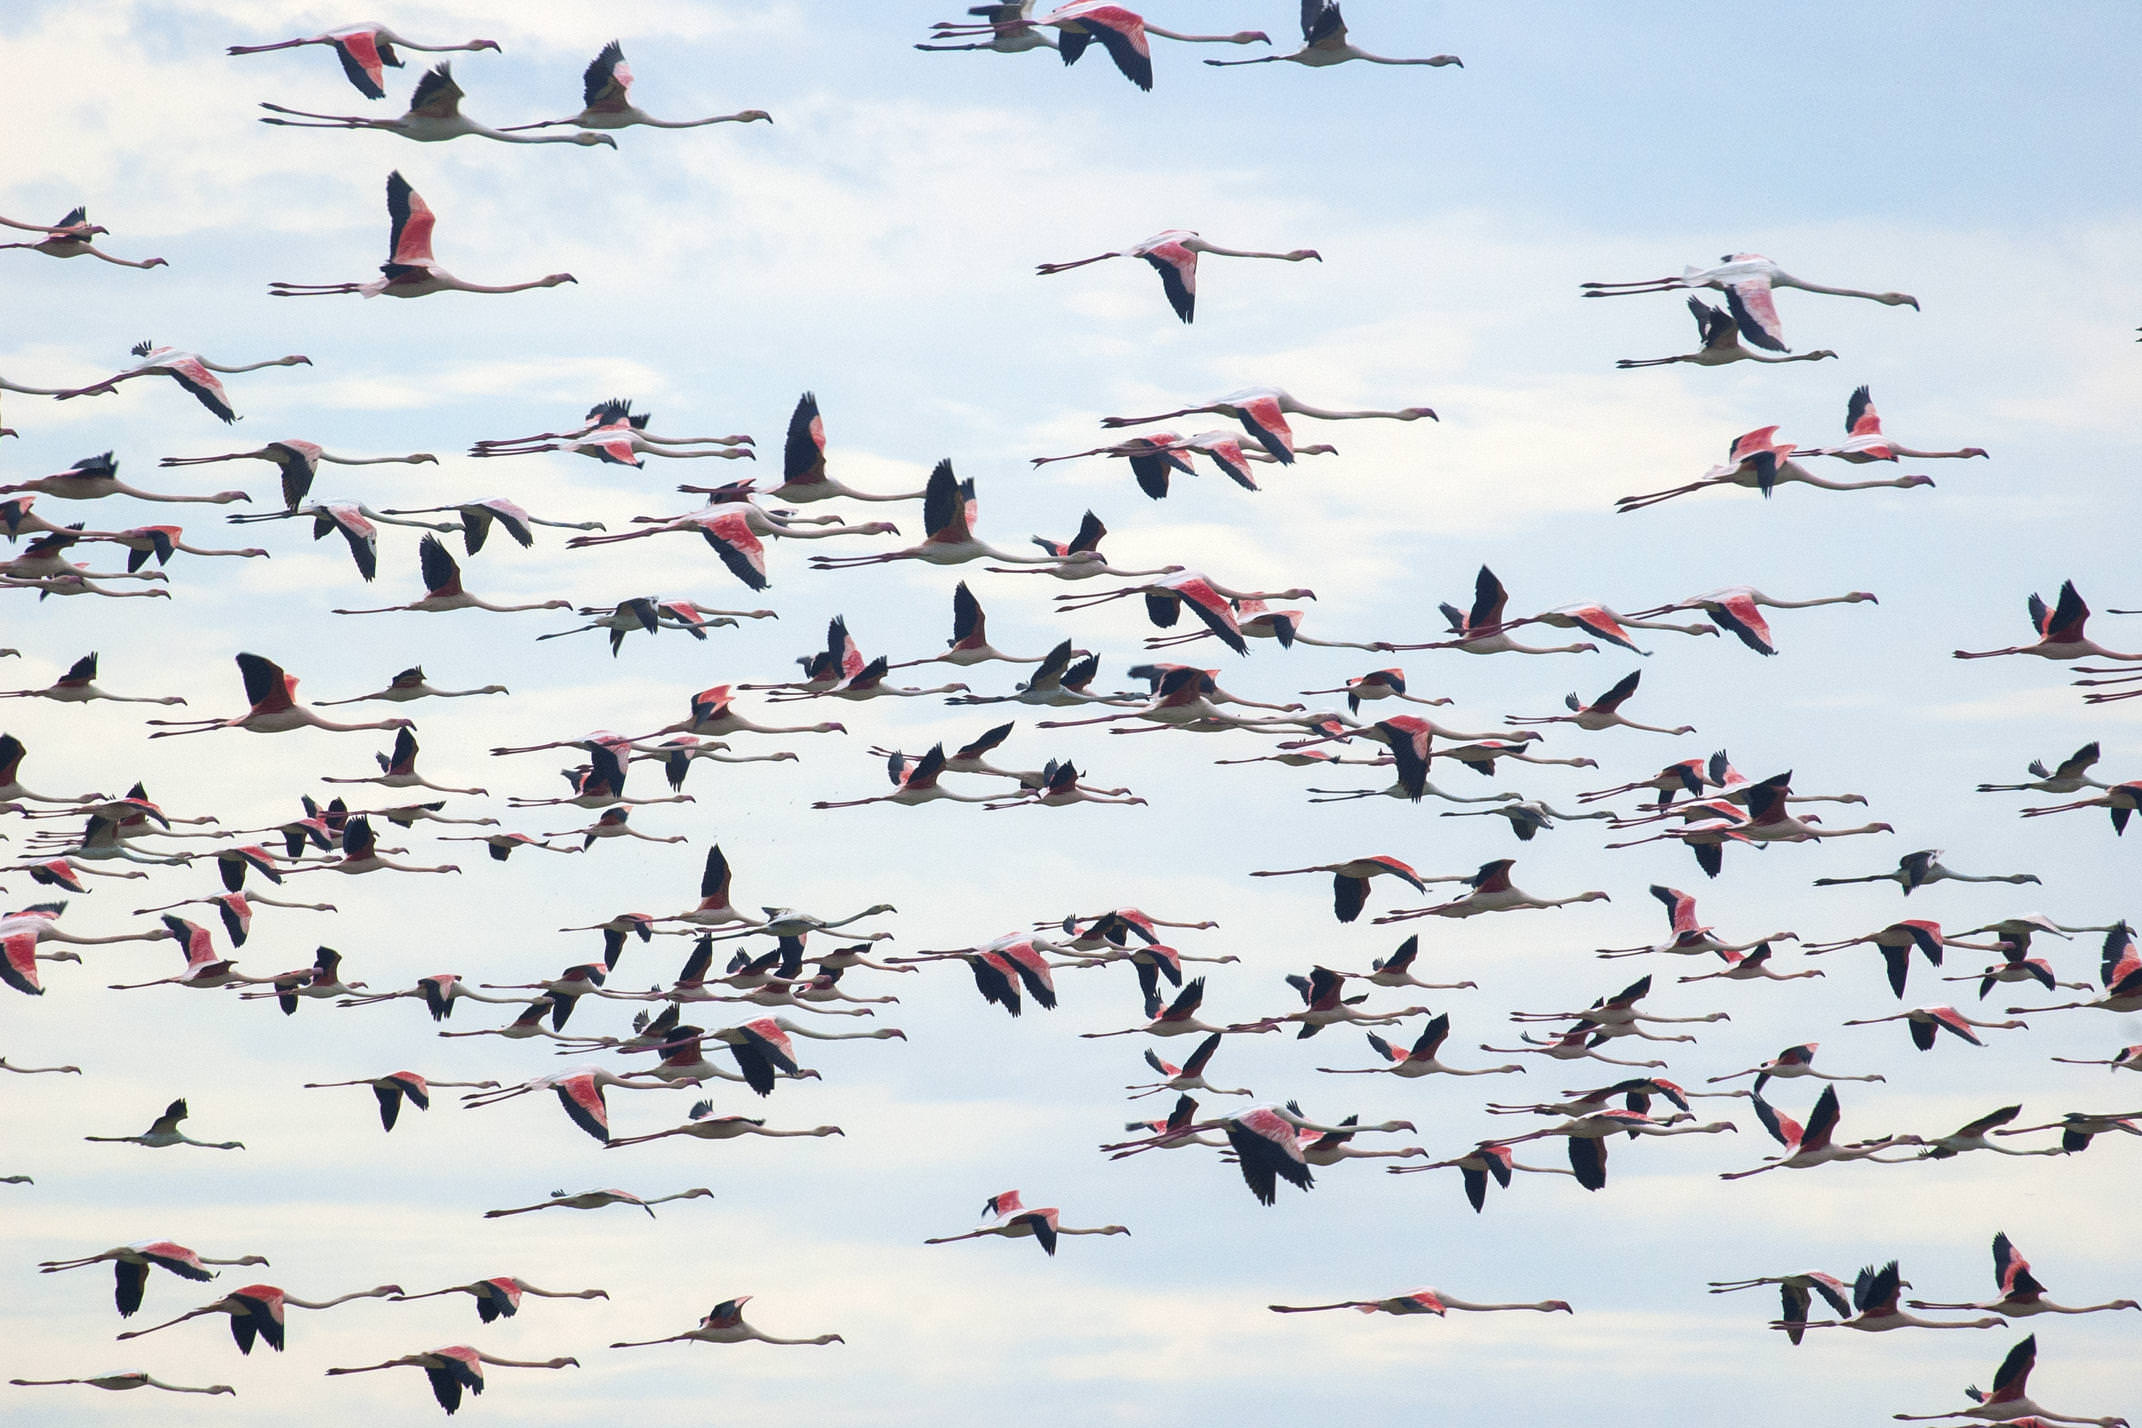 Spain andalucia doñana national park flamingos c jcgonzalez